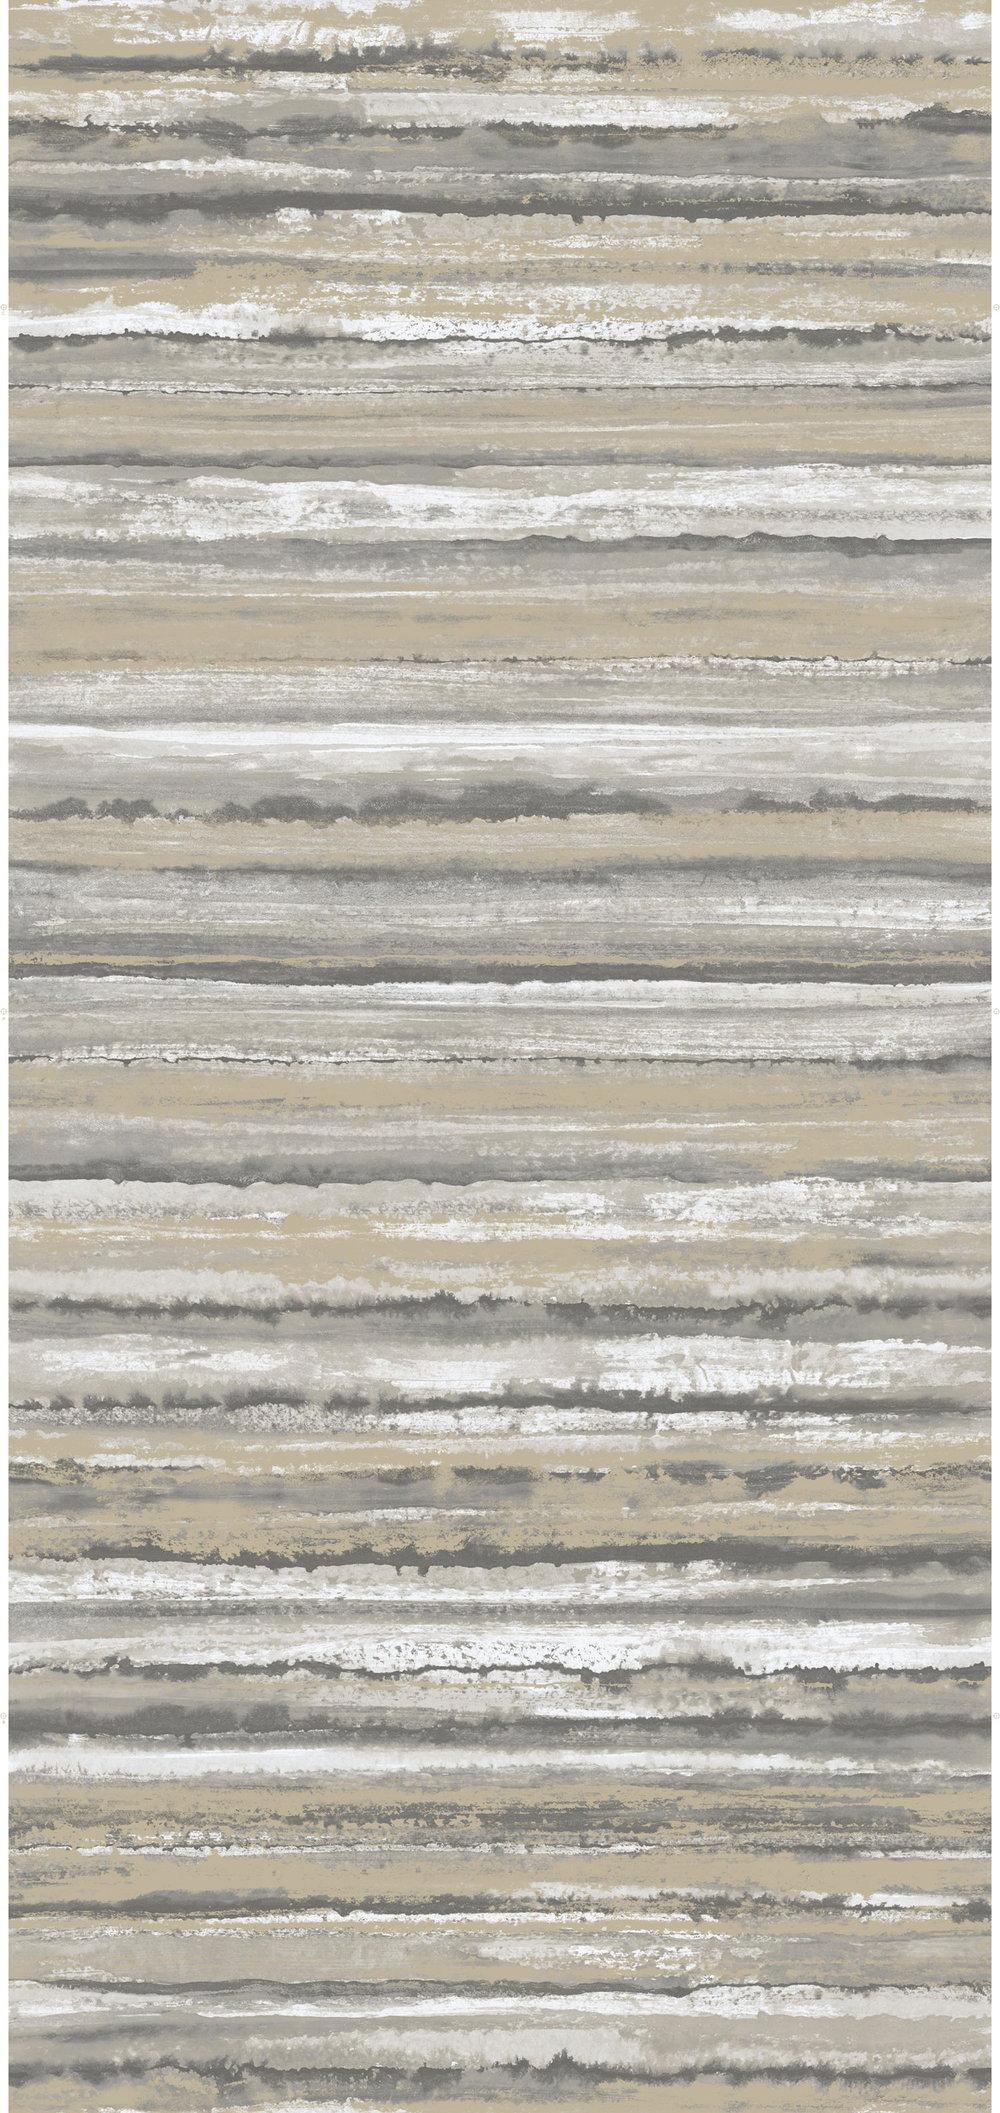 Therassia Wallpaper - Botswana Agate - by Anthology